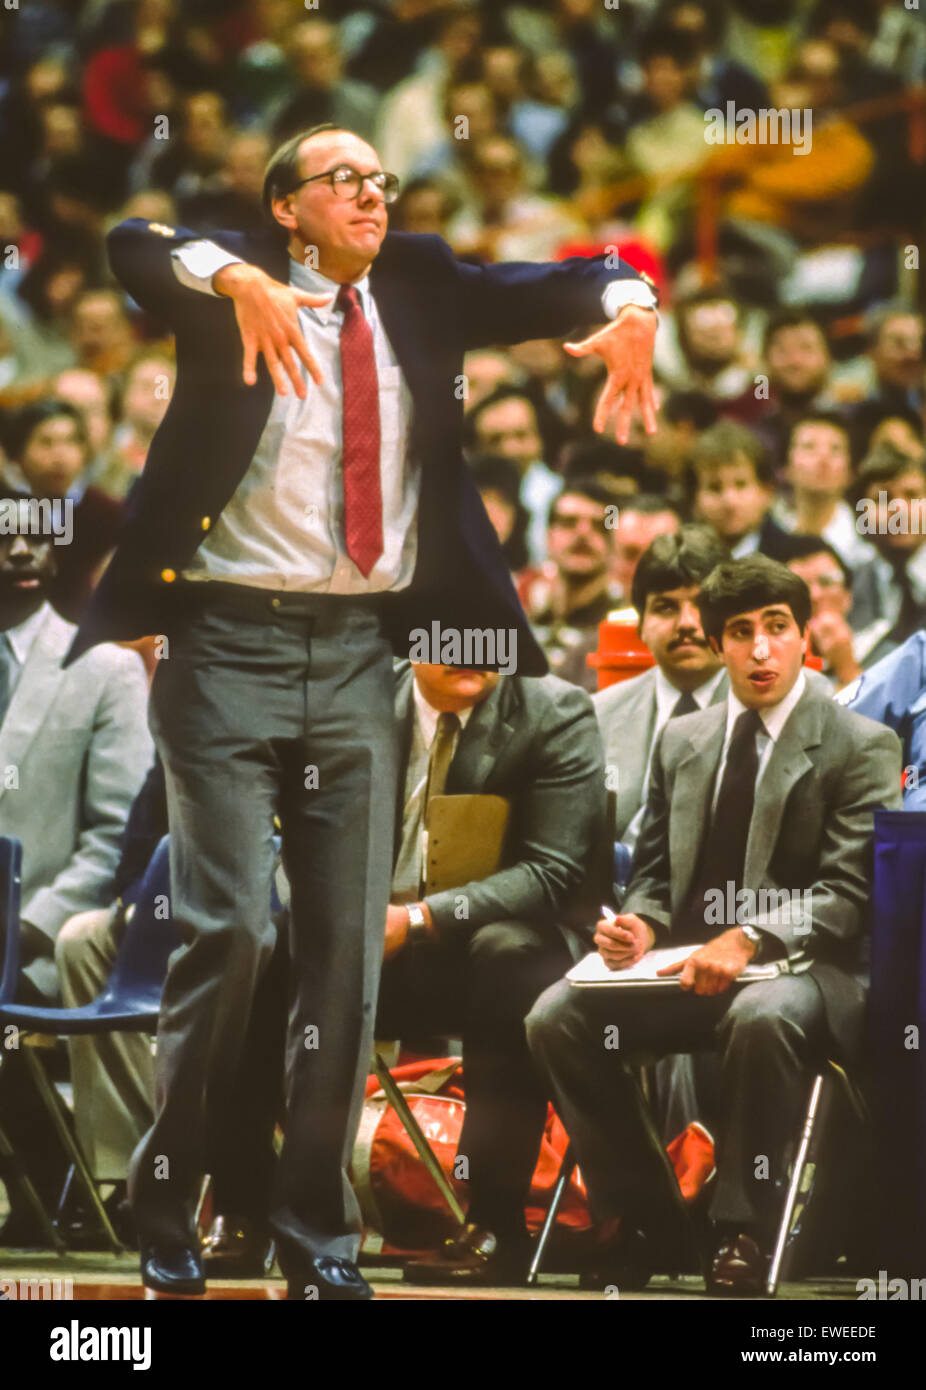 SYRACUSE, NEW YORK, USA - Coach Jim Boeheim gesturing during Syracuse Orangemen college NCAA basketball game in - Stock Image